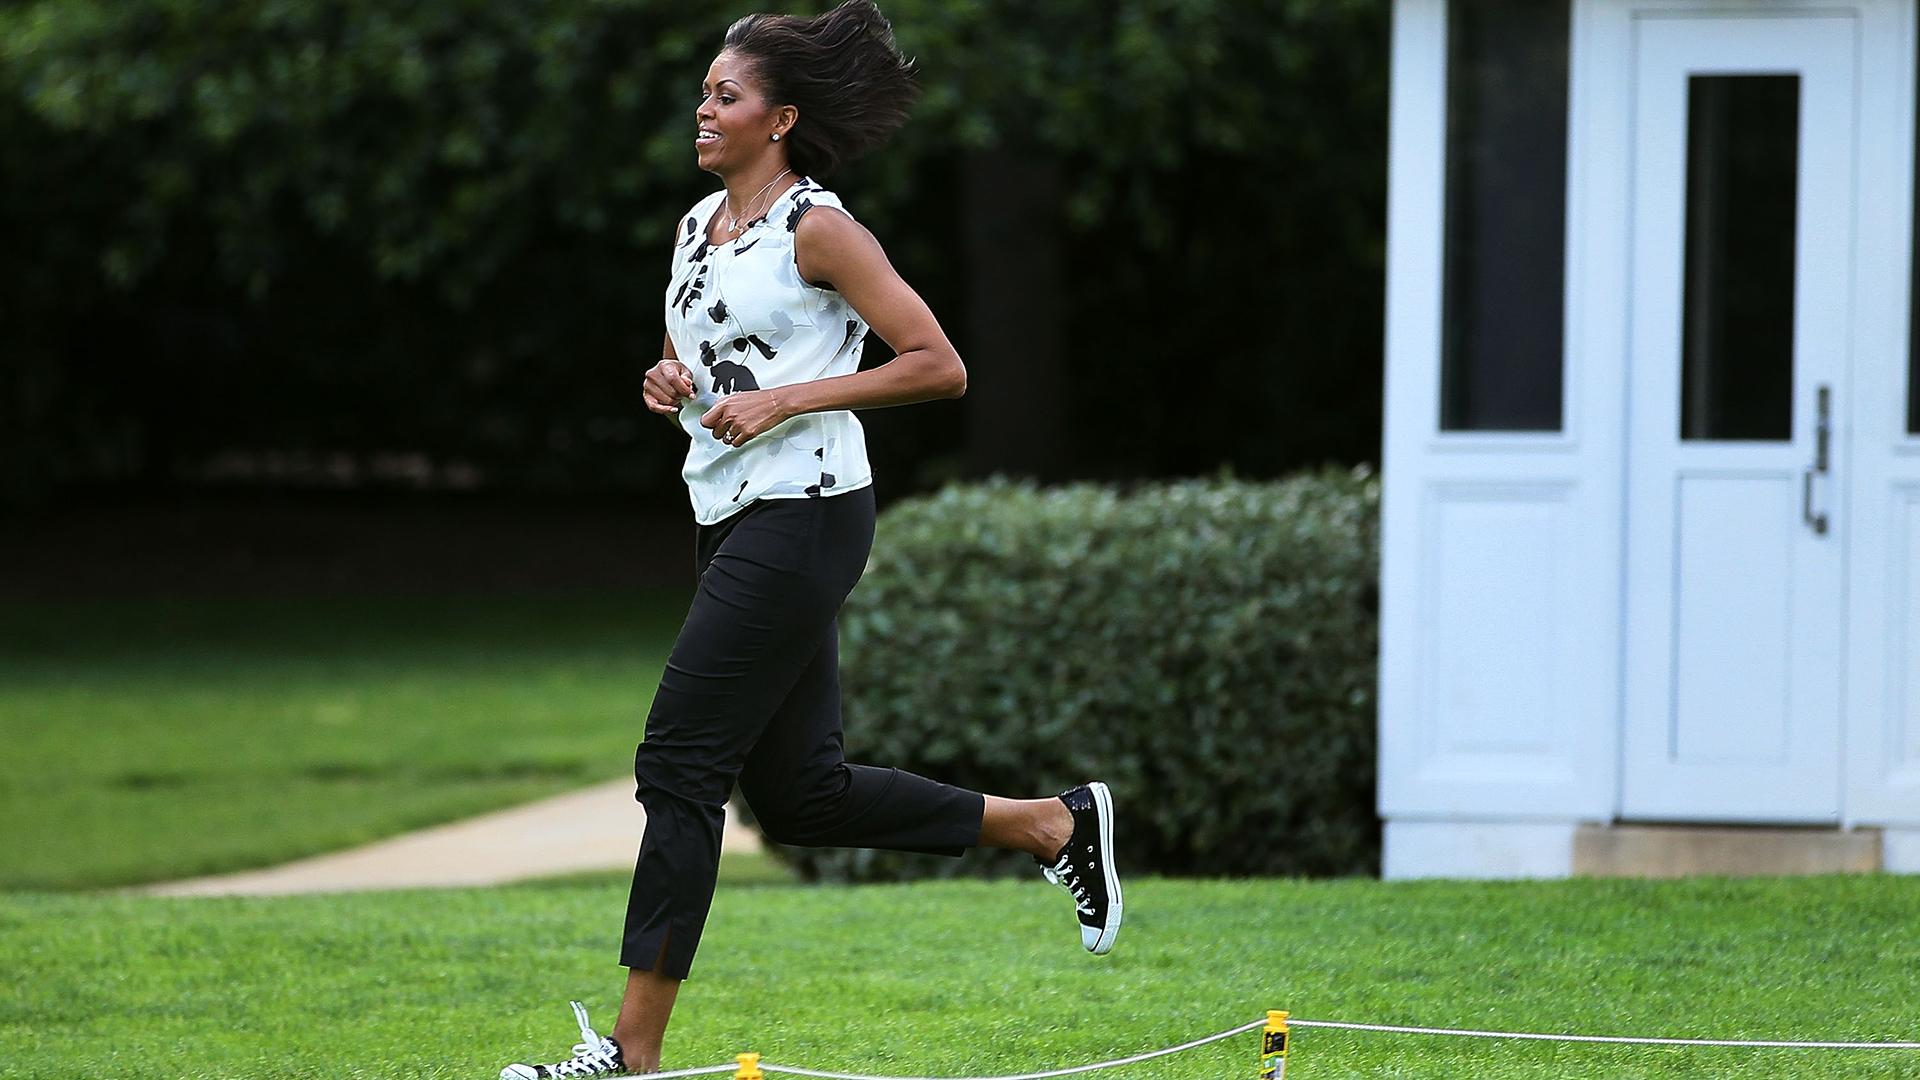 Image result for Michelle Obama running